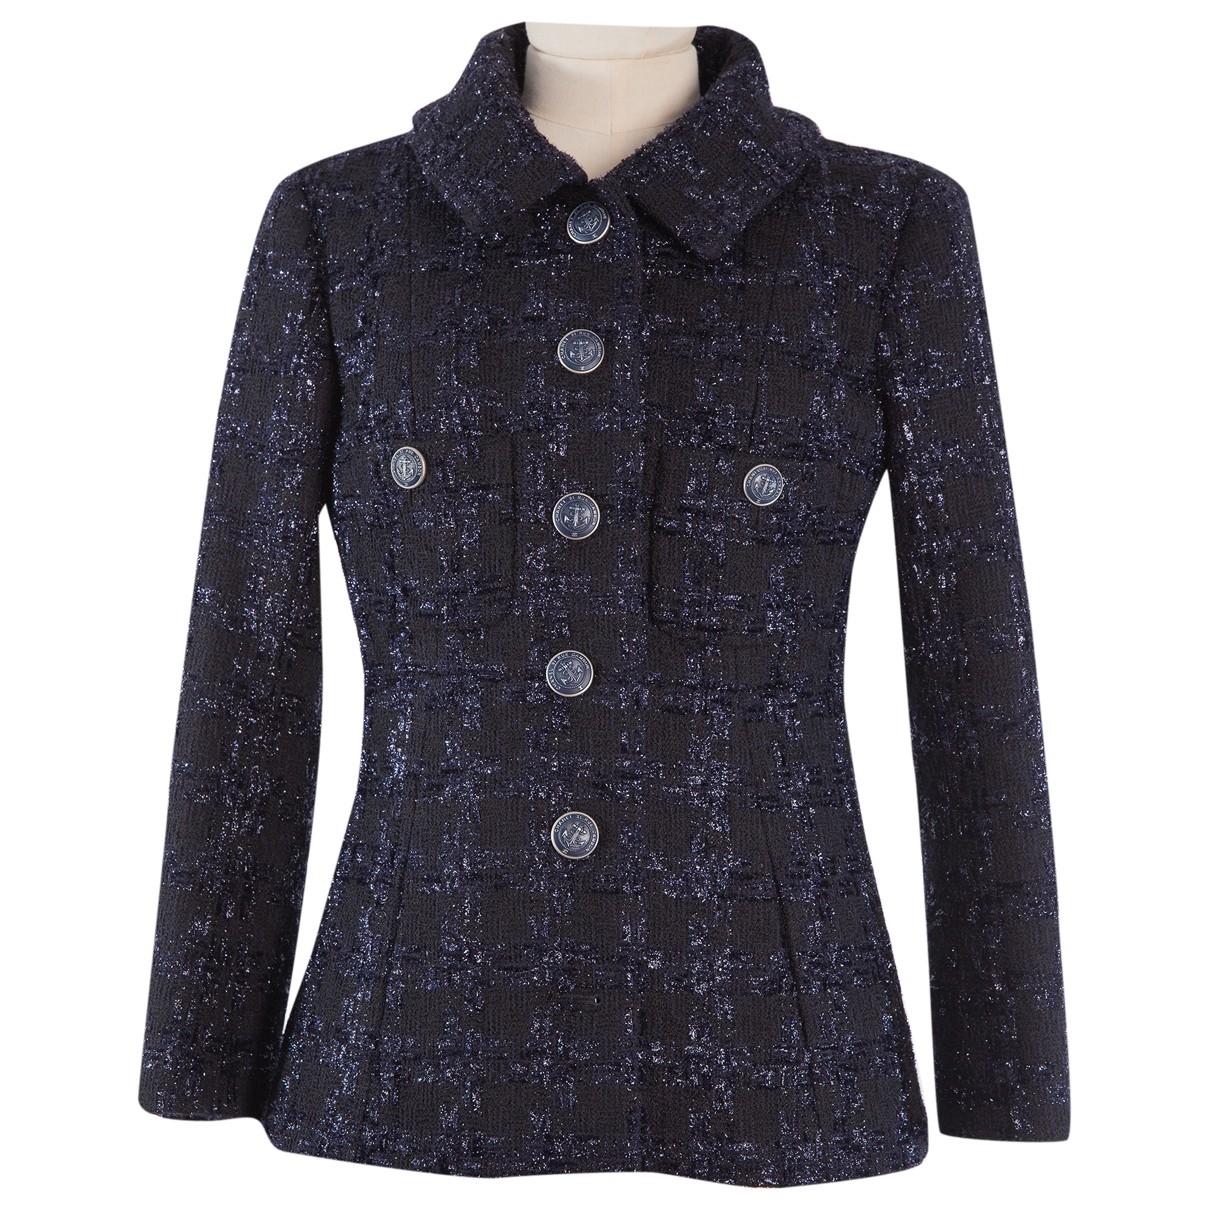 Chanel - Veste   pour femme en tweed - bleu